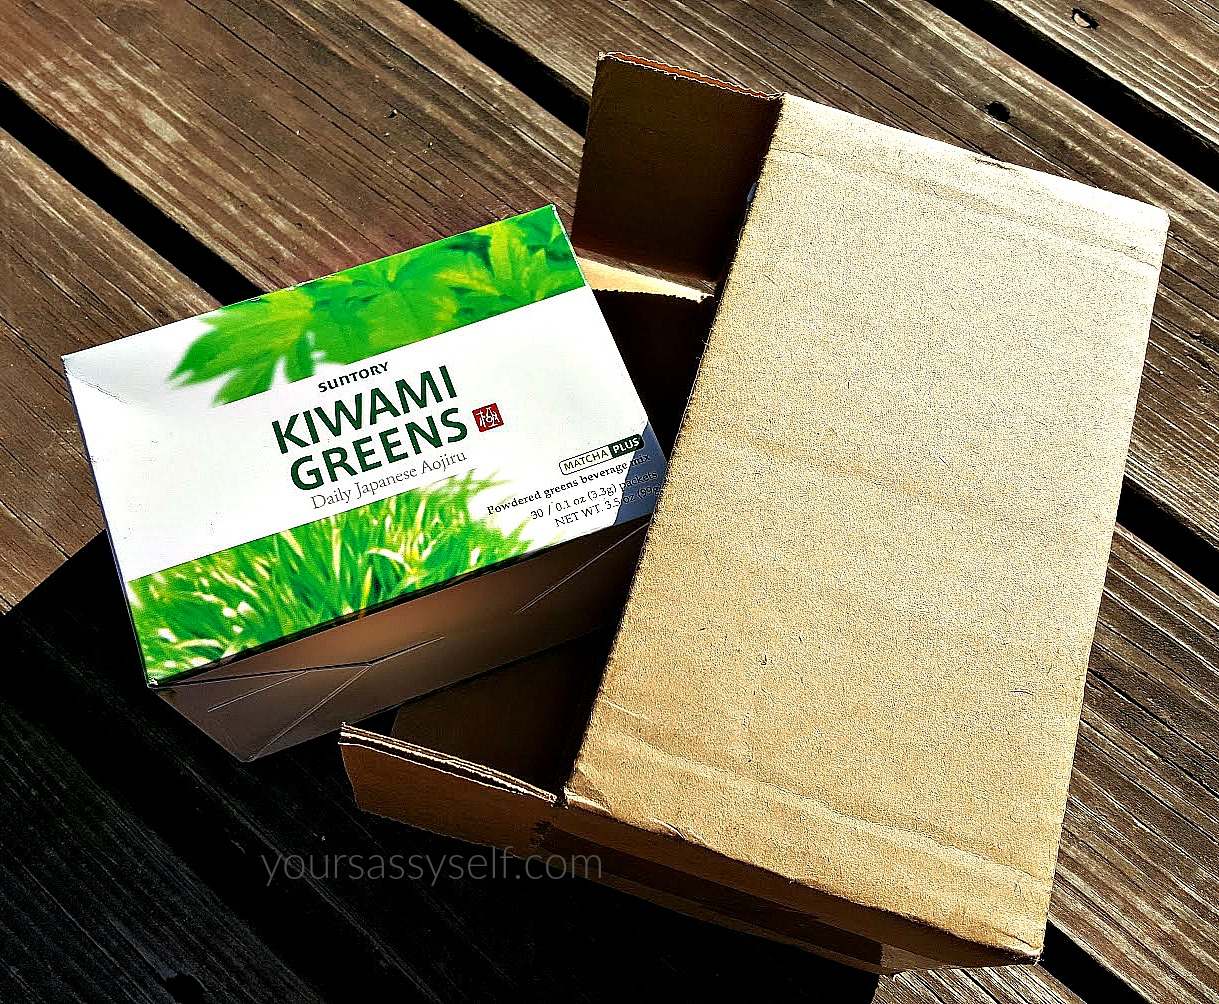 Kiwami Greens Subscription Delivery - yoursassyself.com